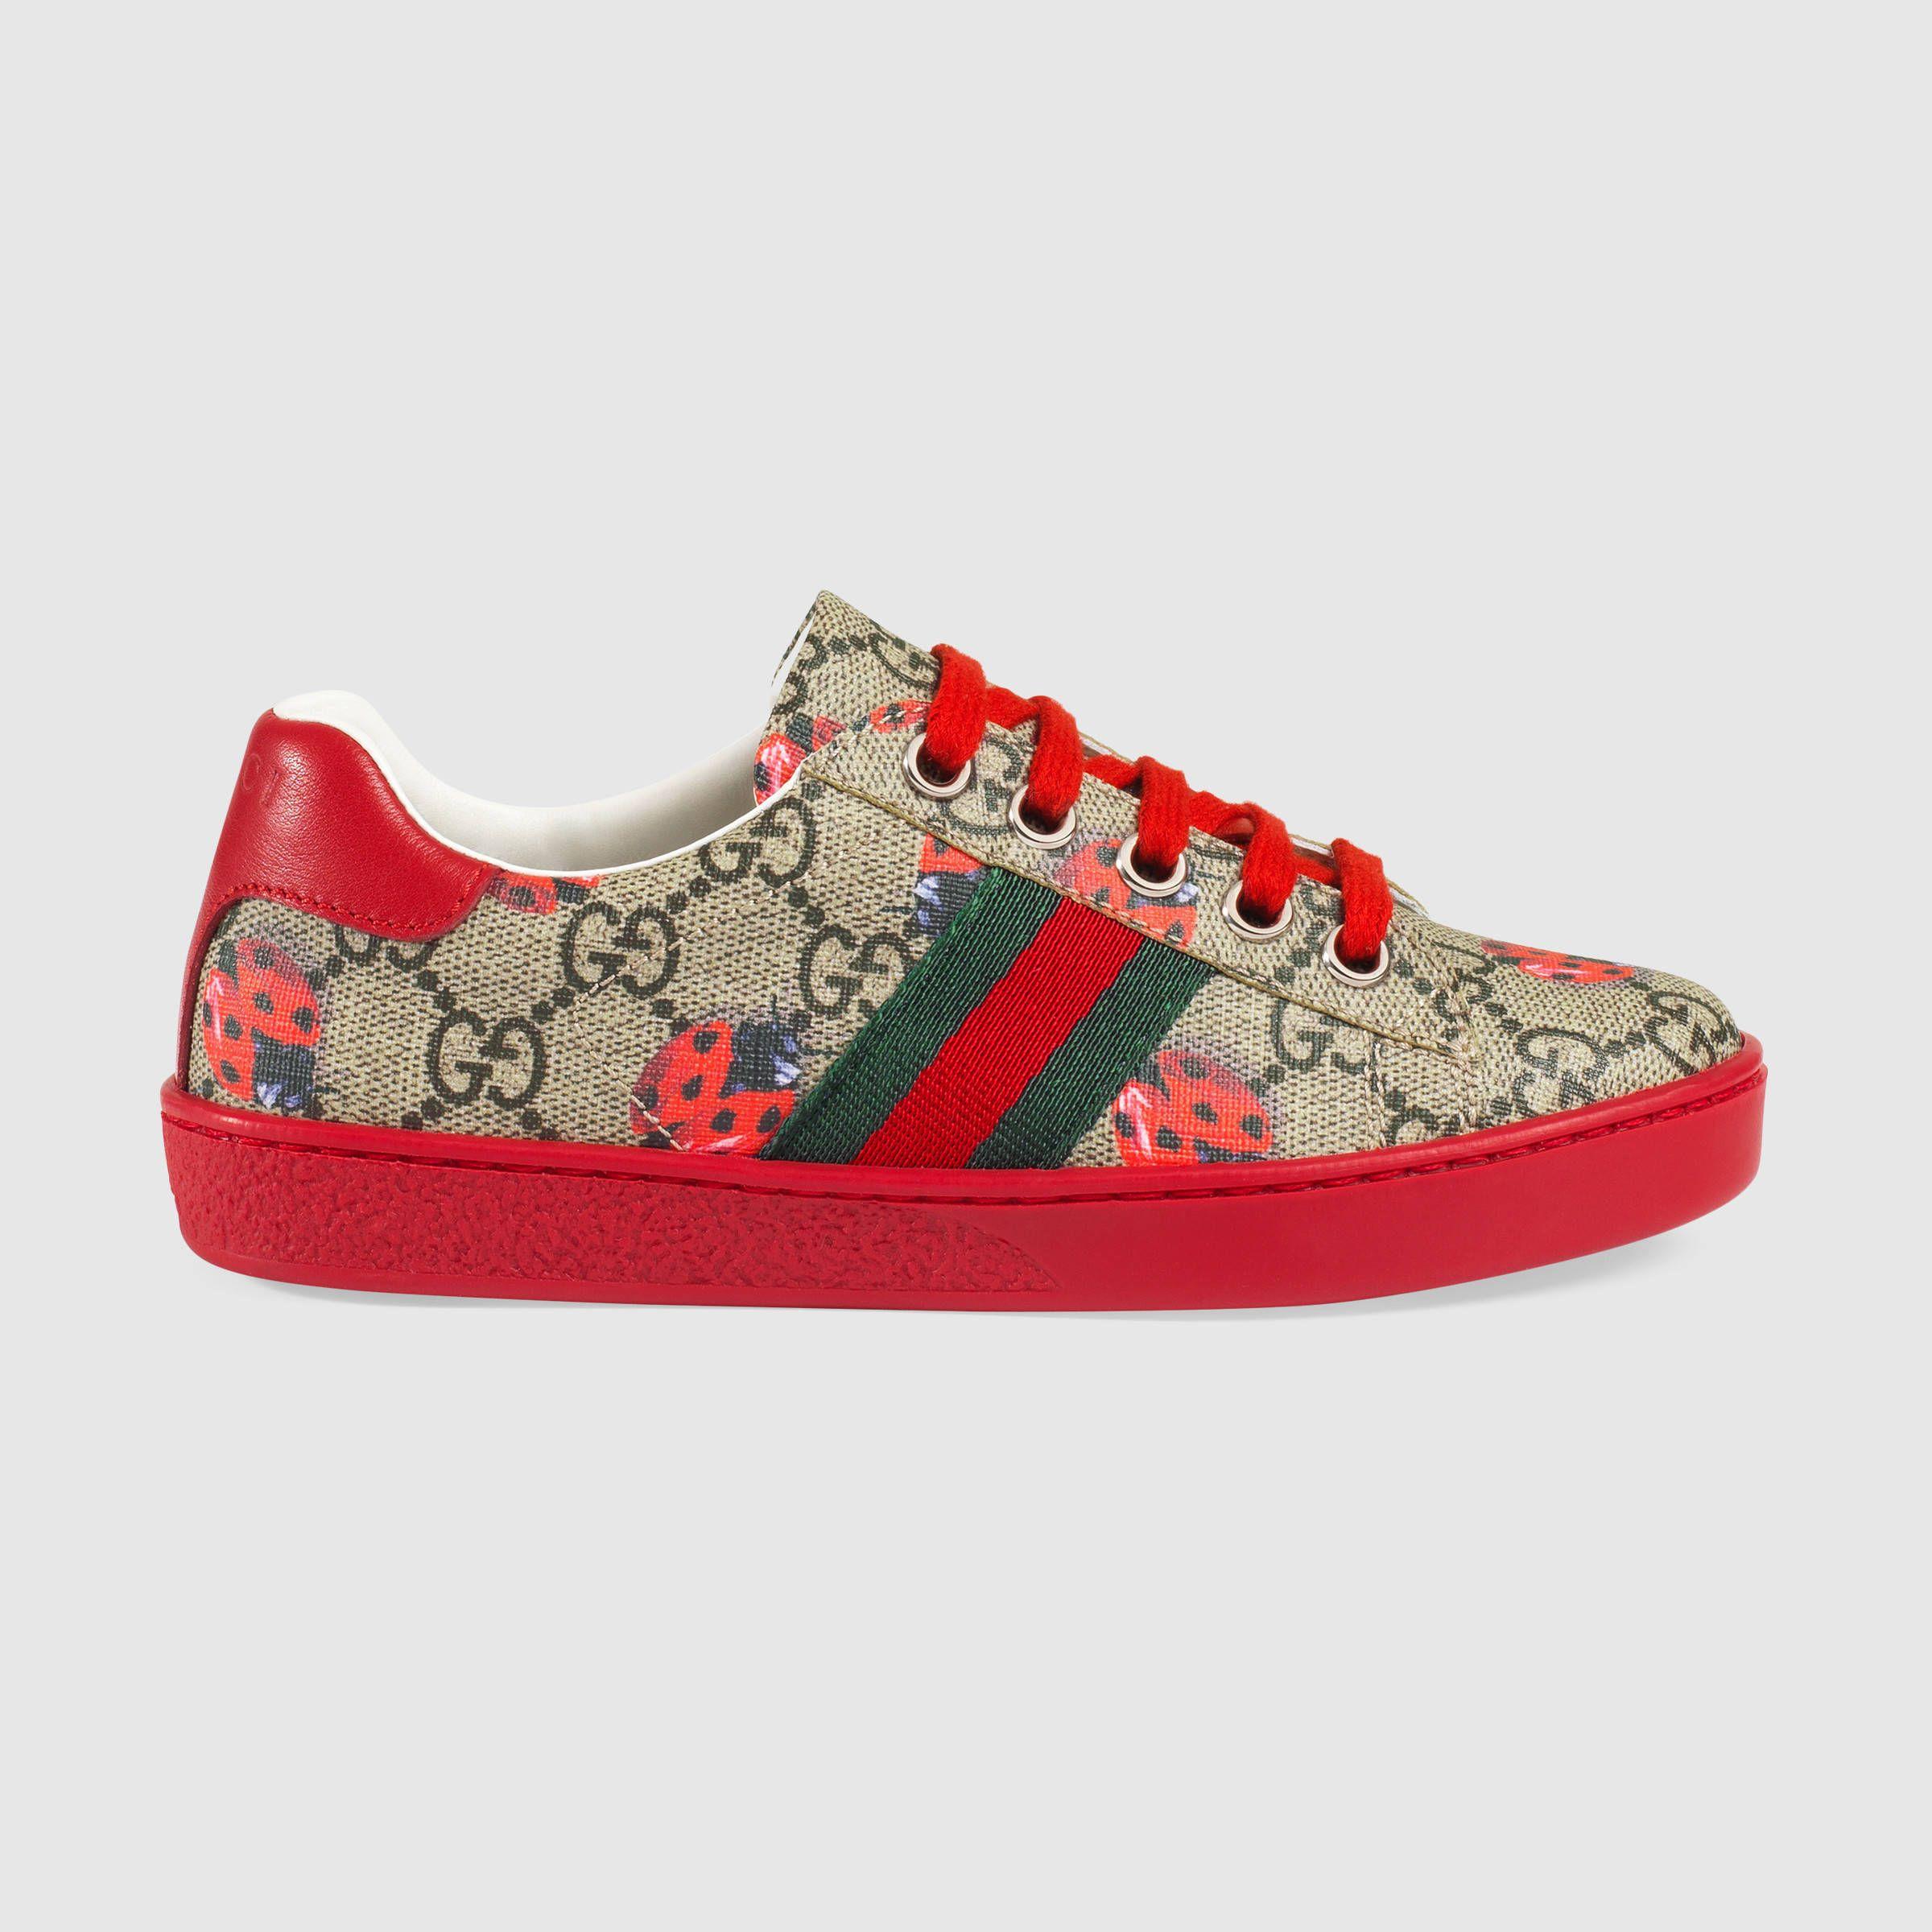 345d1a8bca7 Gucci Children - Children s GG ladybugs low-top Girls Sneakers